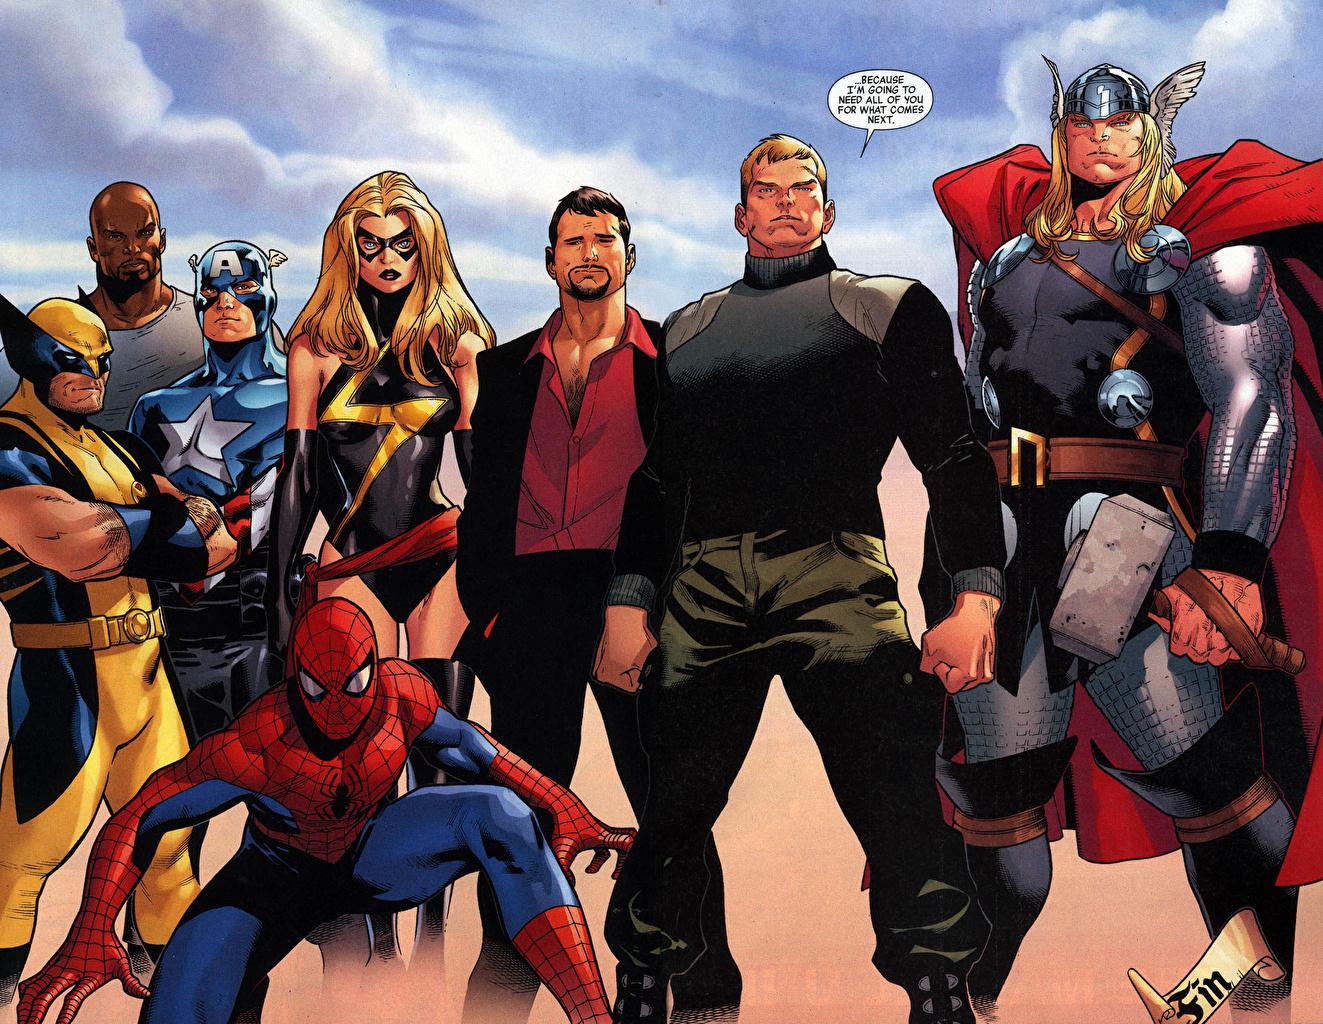 Bakgrunnsbilder til skrivebordet Superhelter Thor superhelt Spider-Man superhelt Fantasy